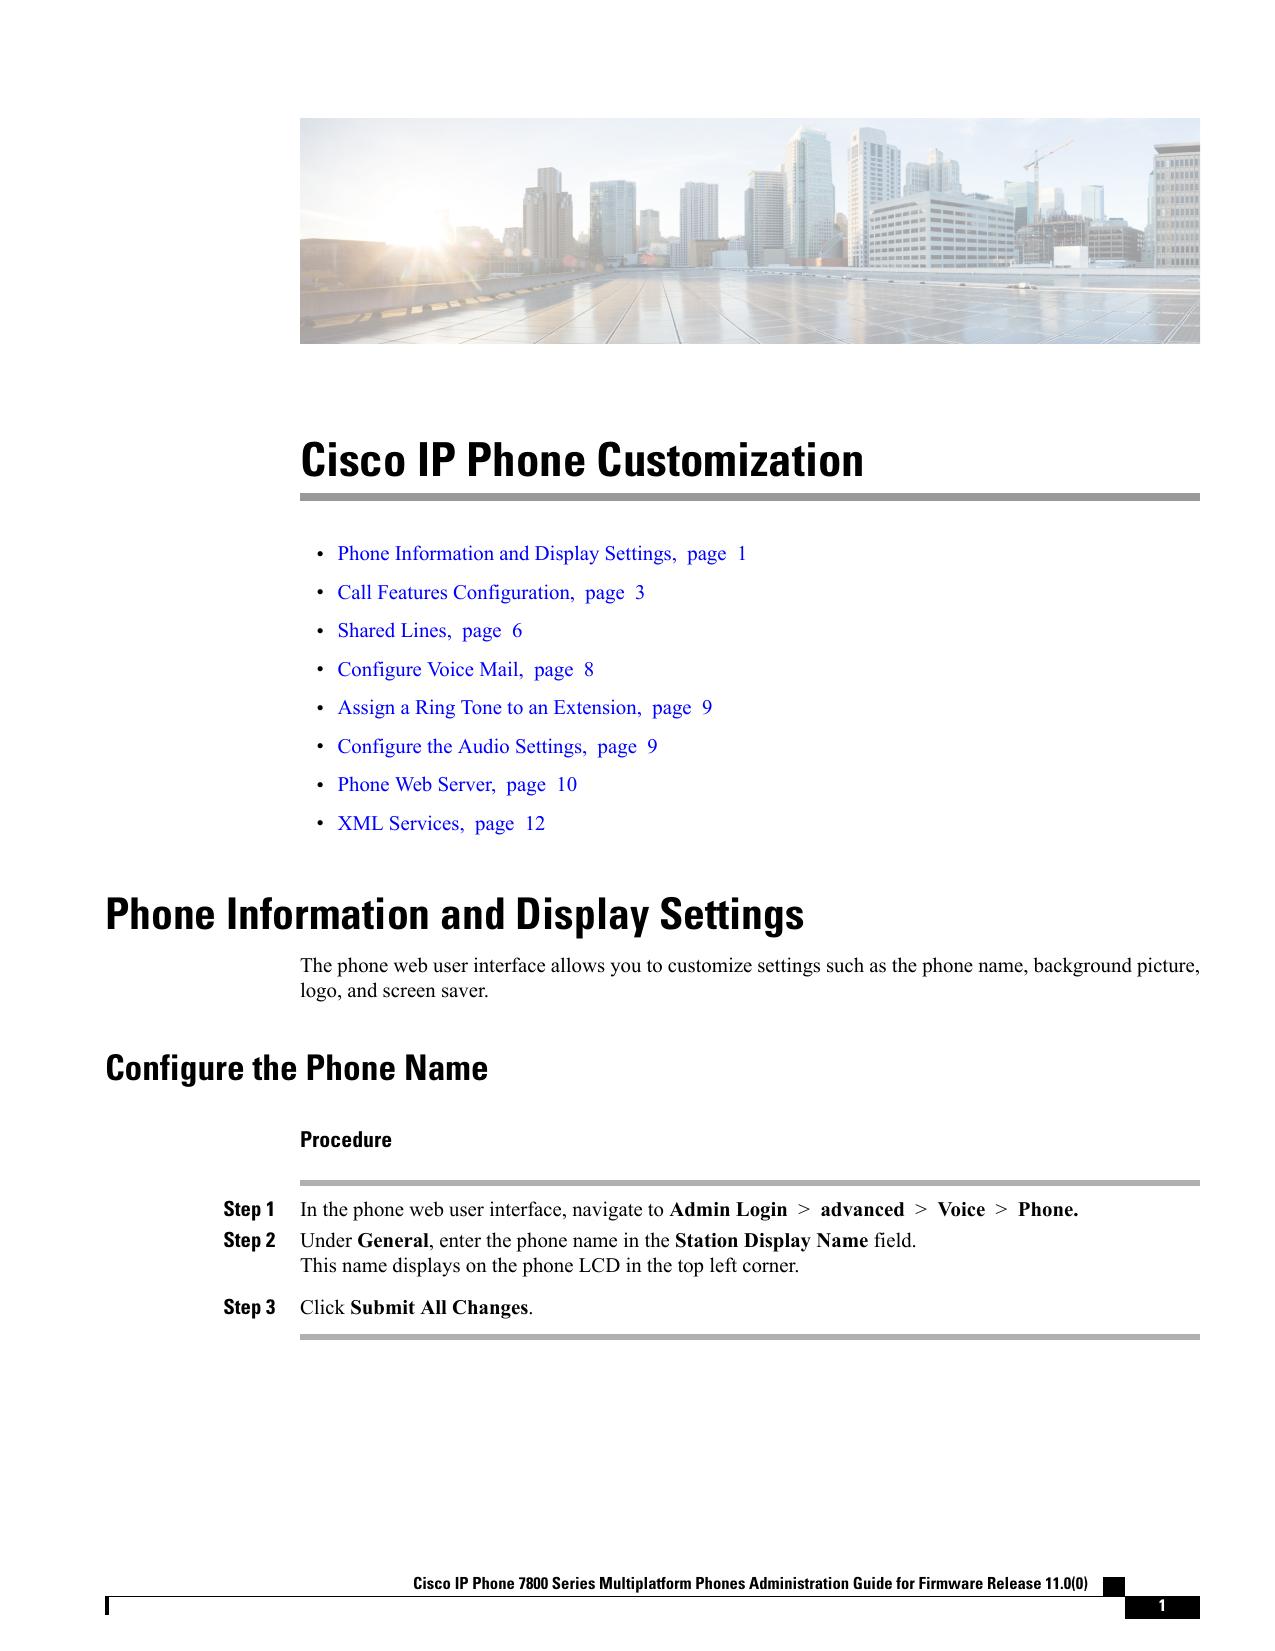 Cisco IP Phone Customization | manualzz com